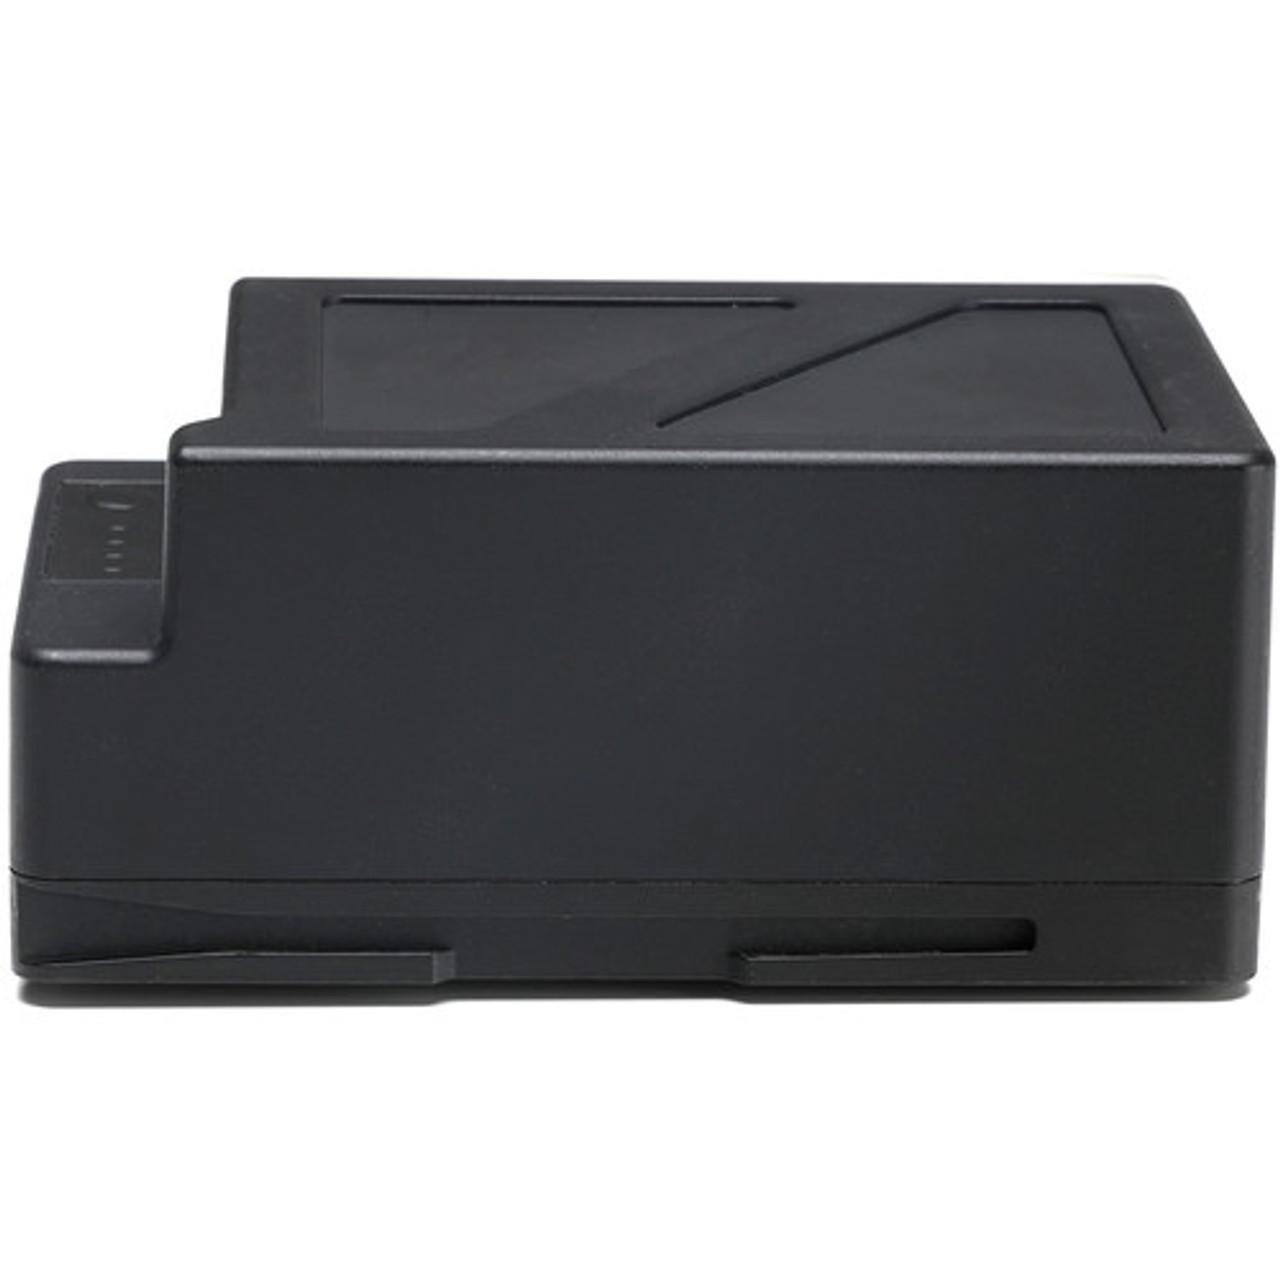 TB55 Intelligent Flight Battery - Matrice 200 Series